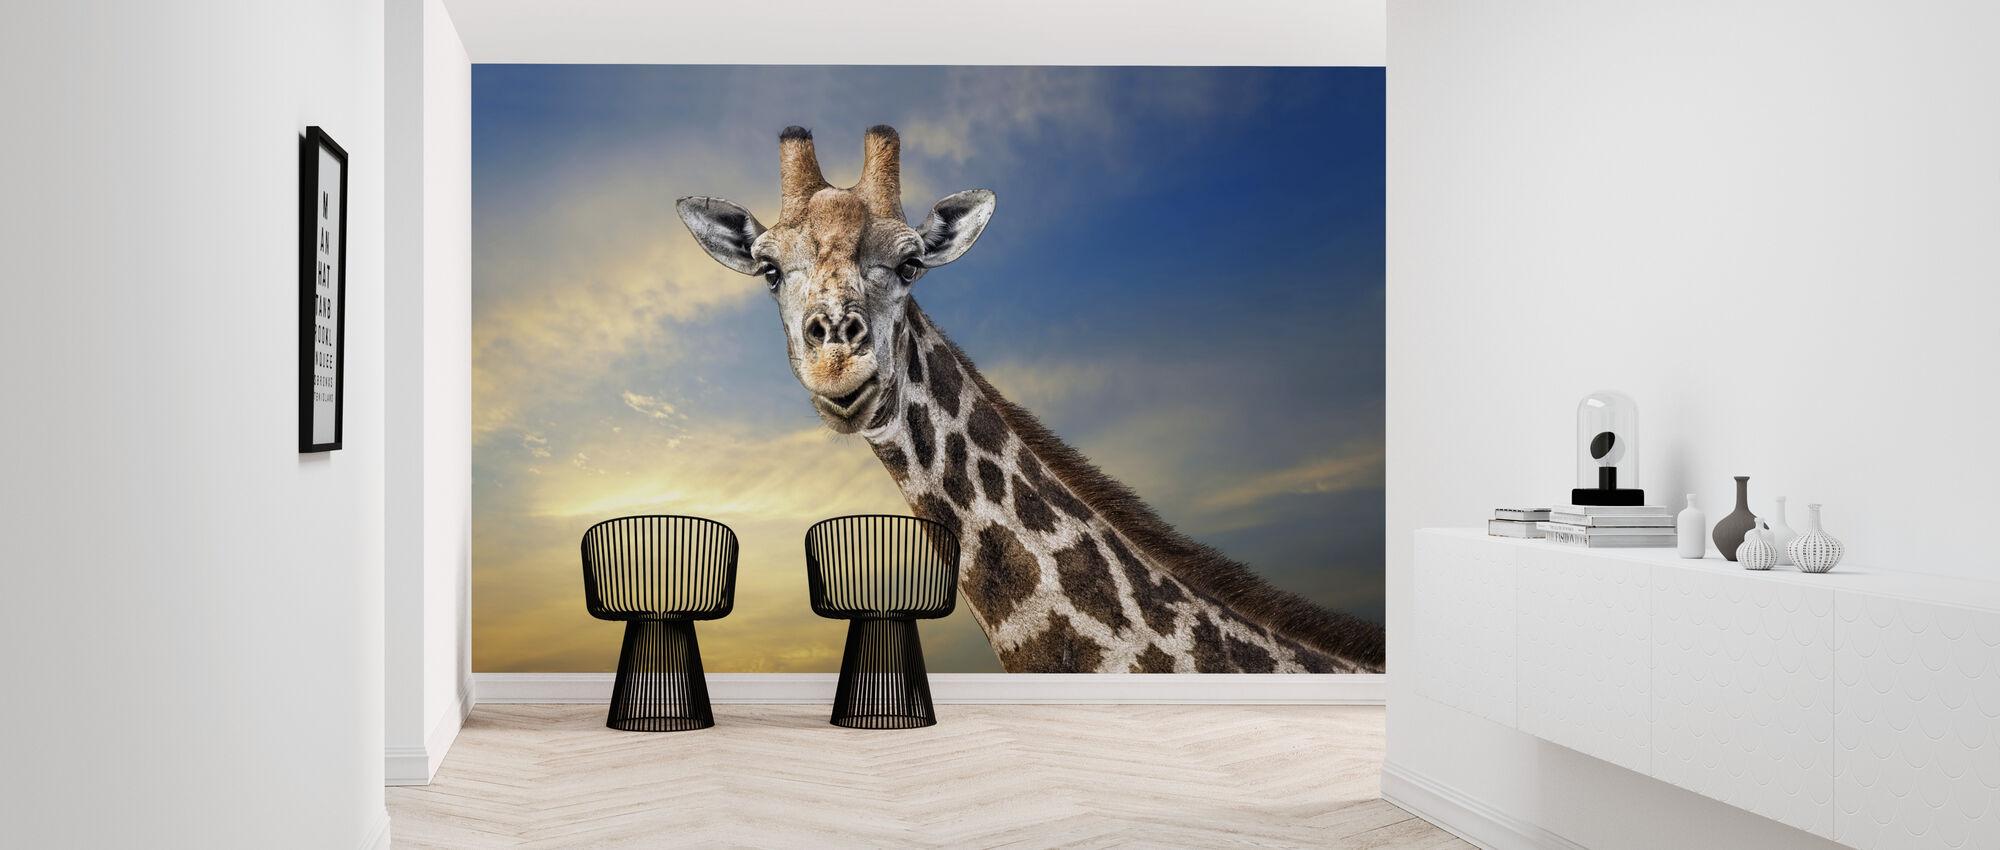 Friendly Giraffe - Wallpaper - Hallway